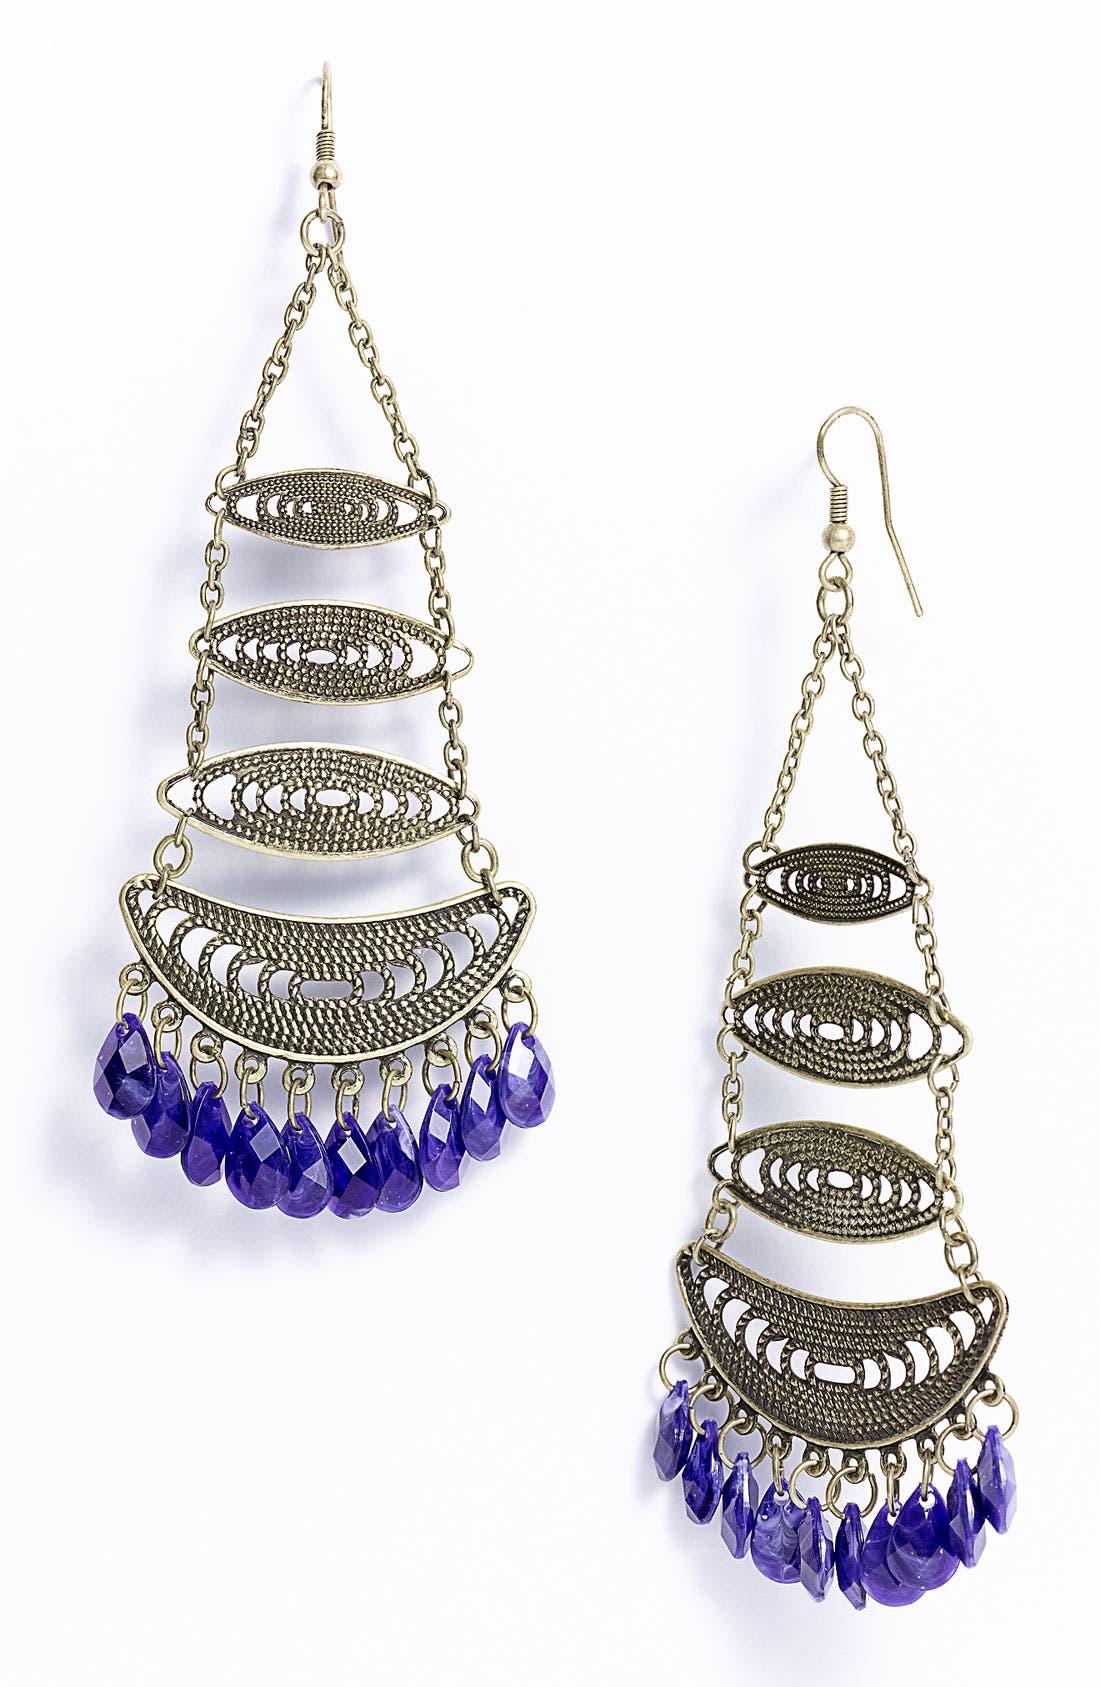 Main Image - Carole Tiered Statement Chandelier Earrings